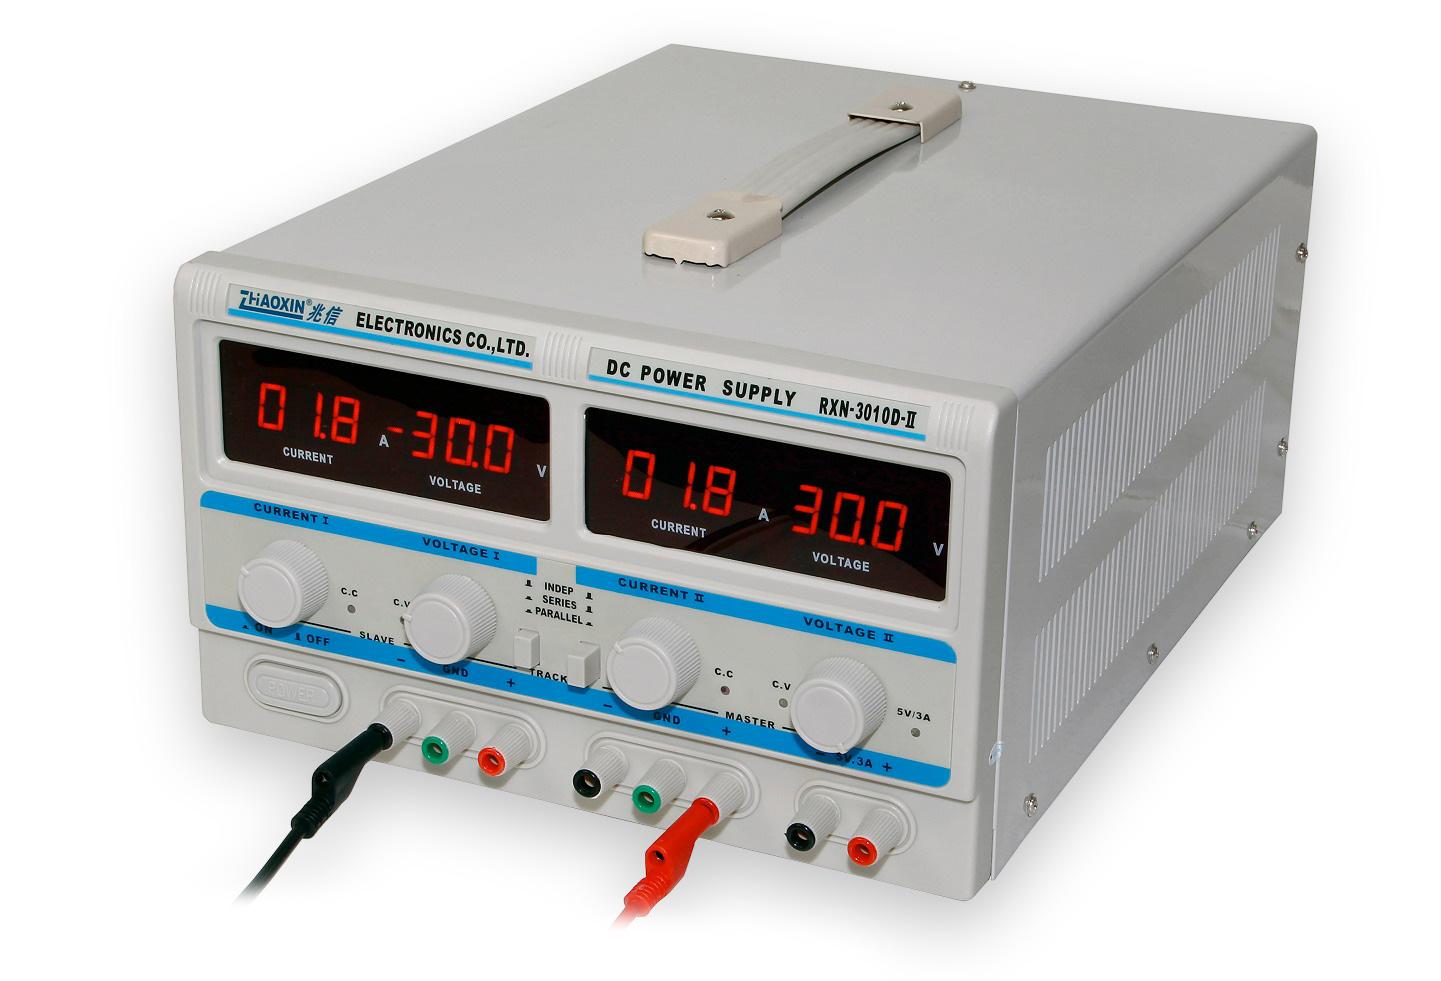 Dvojitý laboratorní zdroj RXN-3010D-II - 2x30V/10A, 60V/10A, 30V/20A